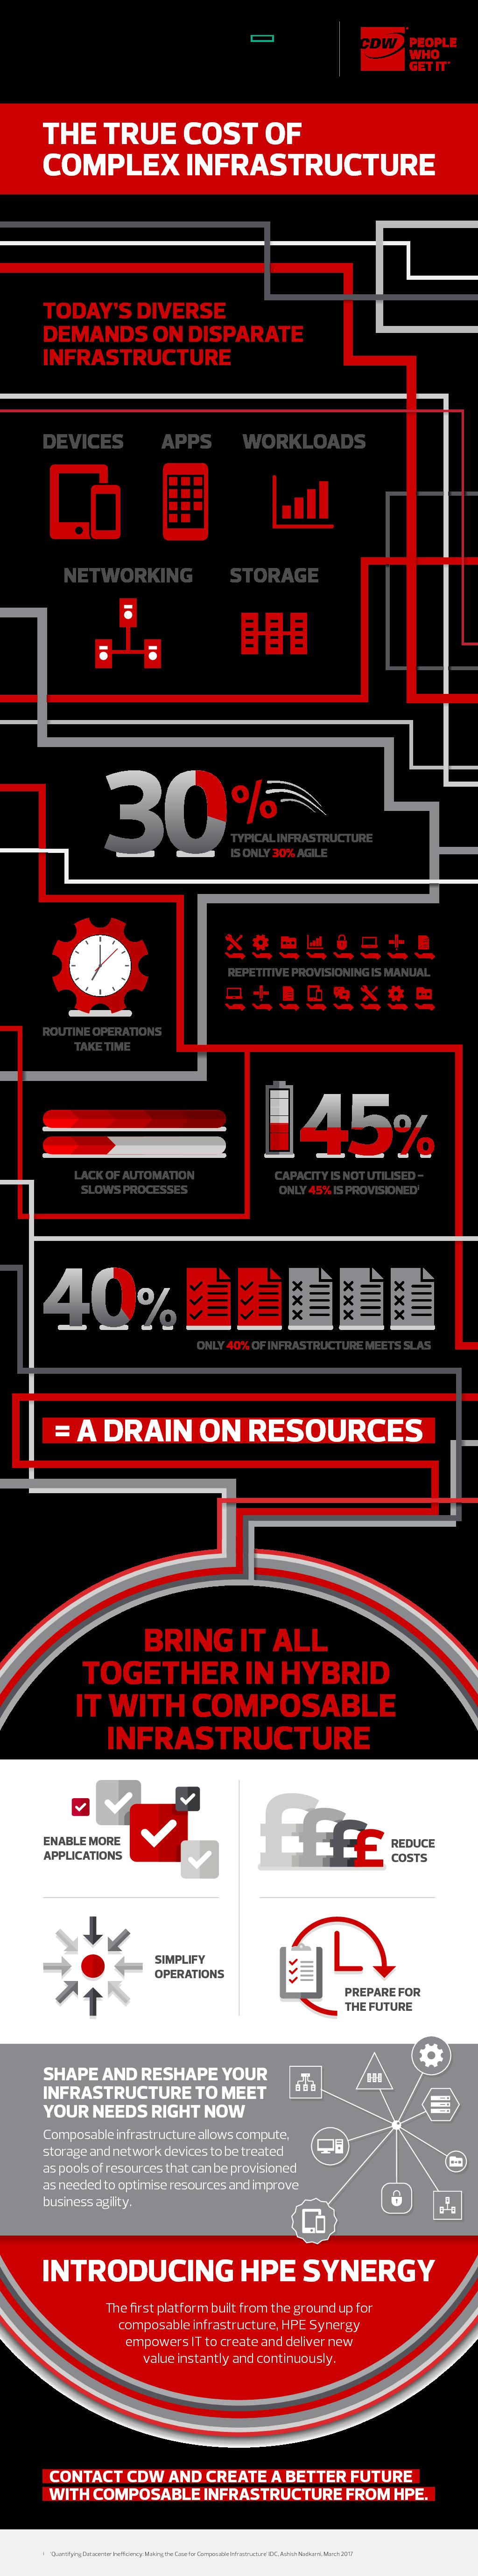 Thumb original synergy infographic v2 final  1